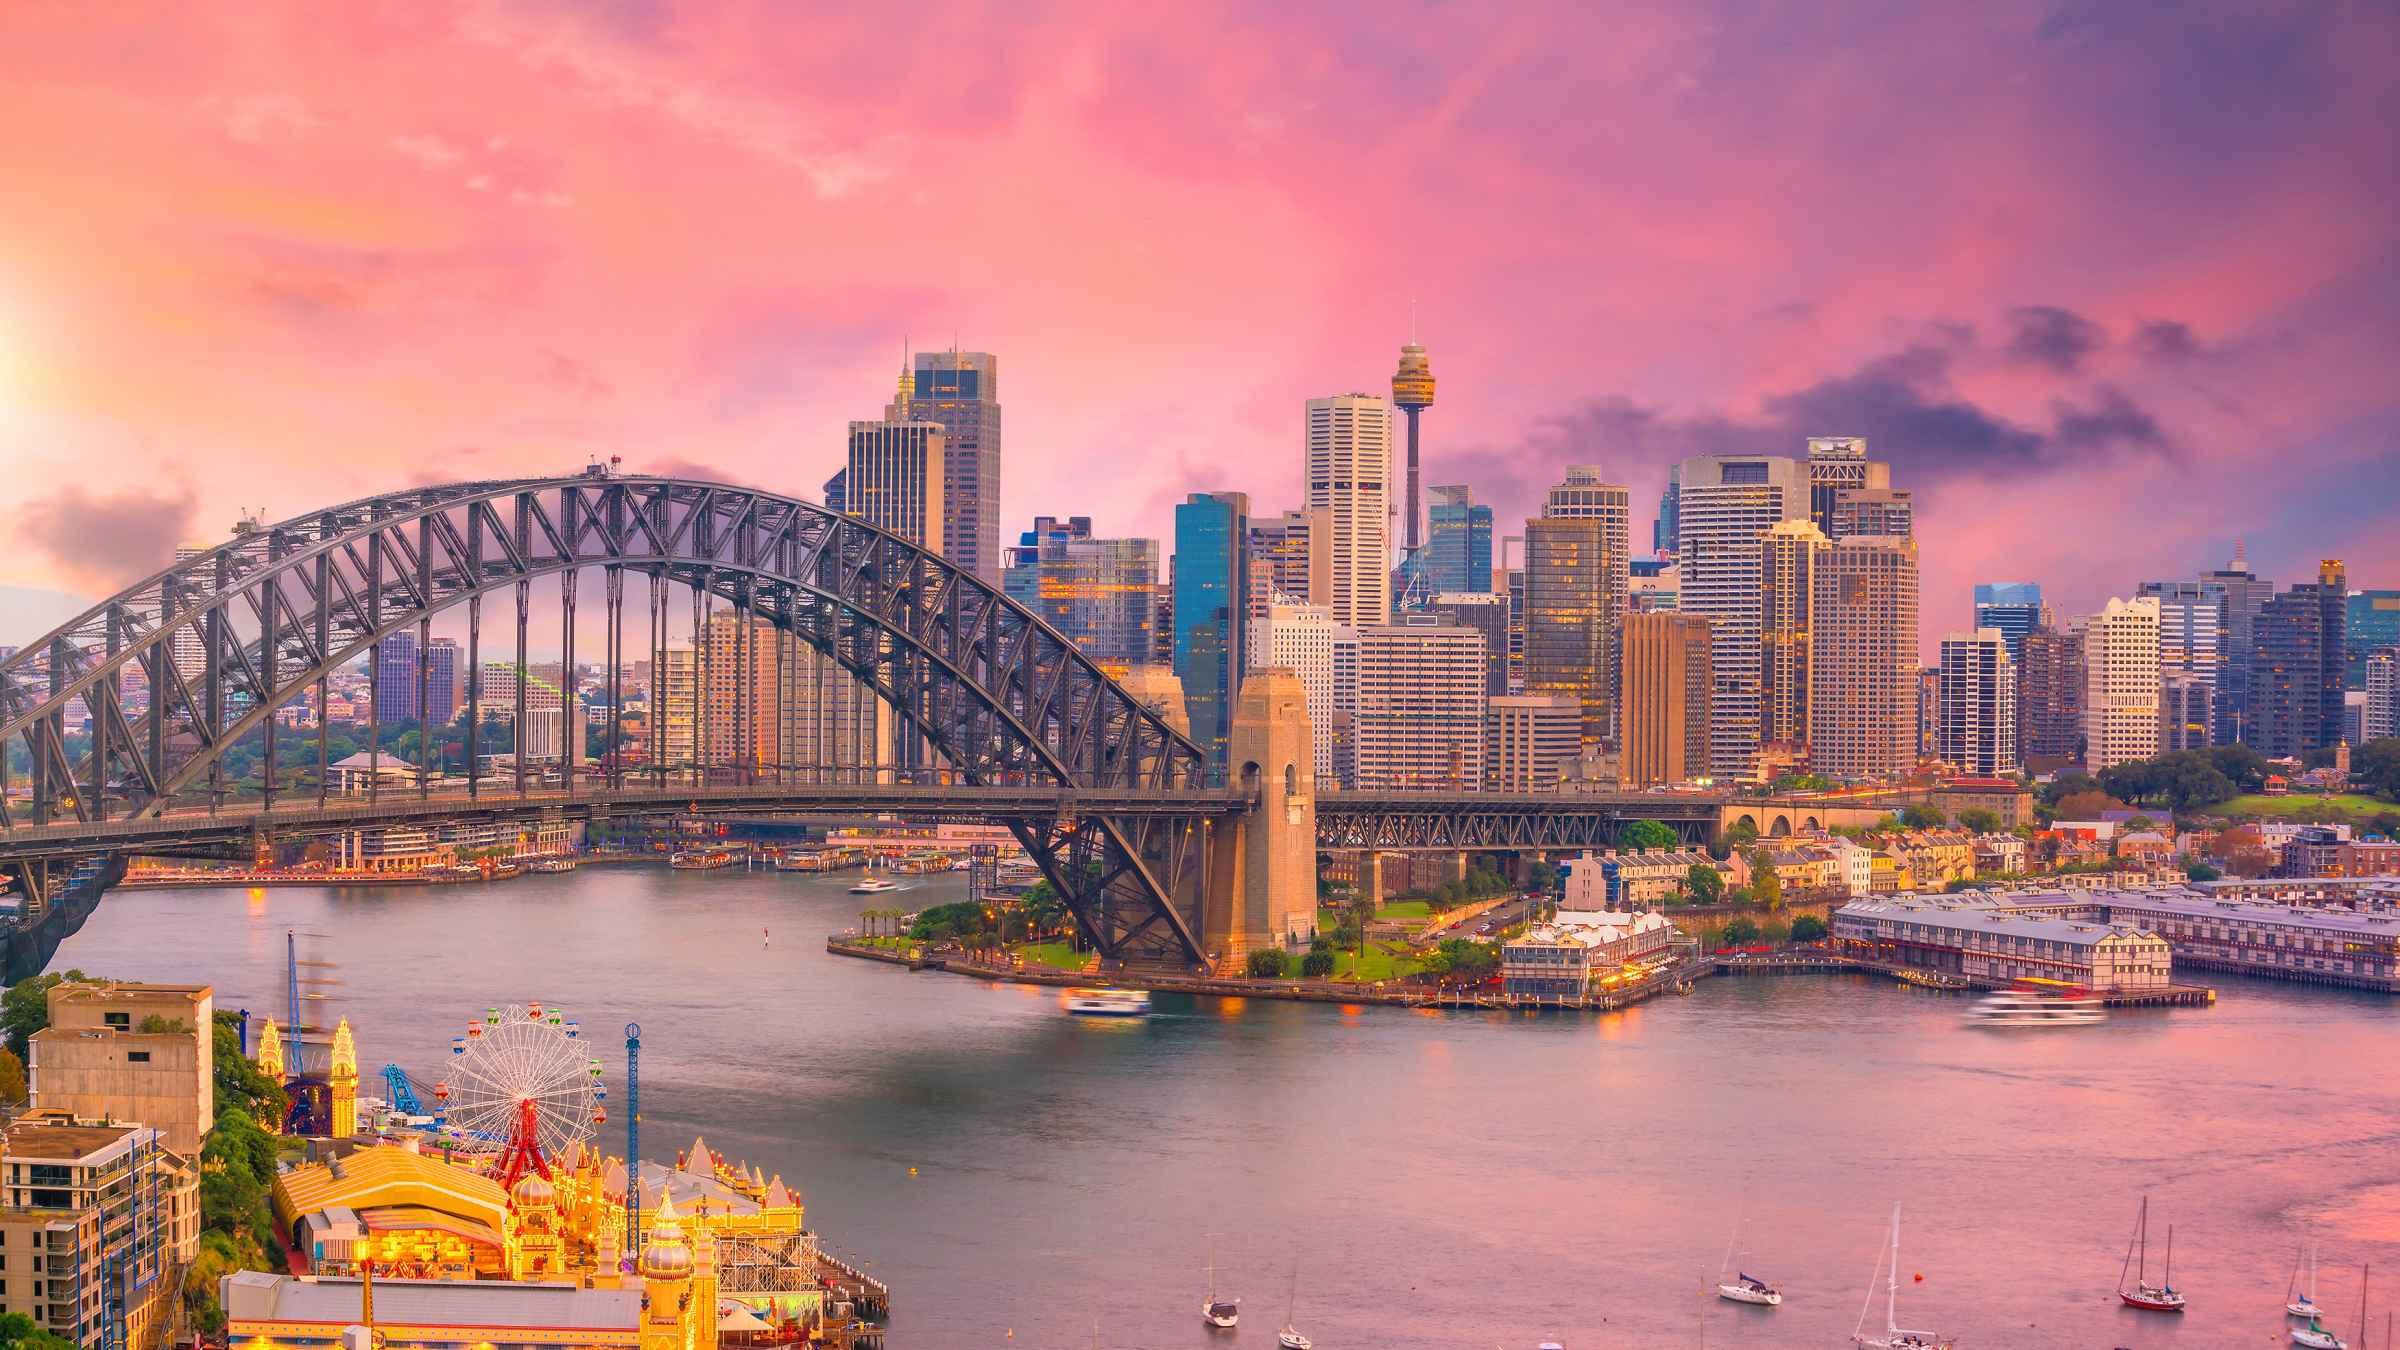 Sydney Harbour: Day, Night, or Express BridgeClimb